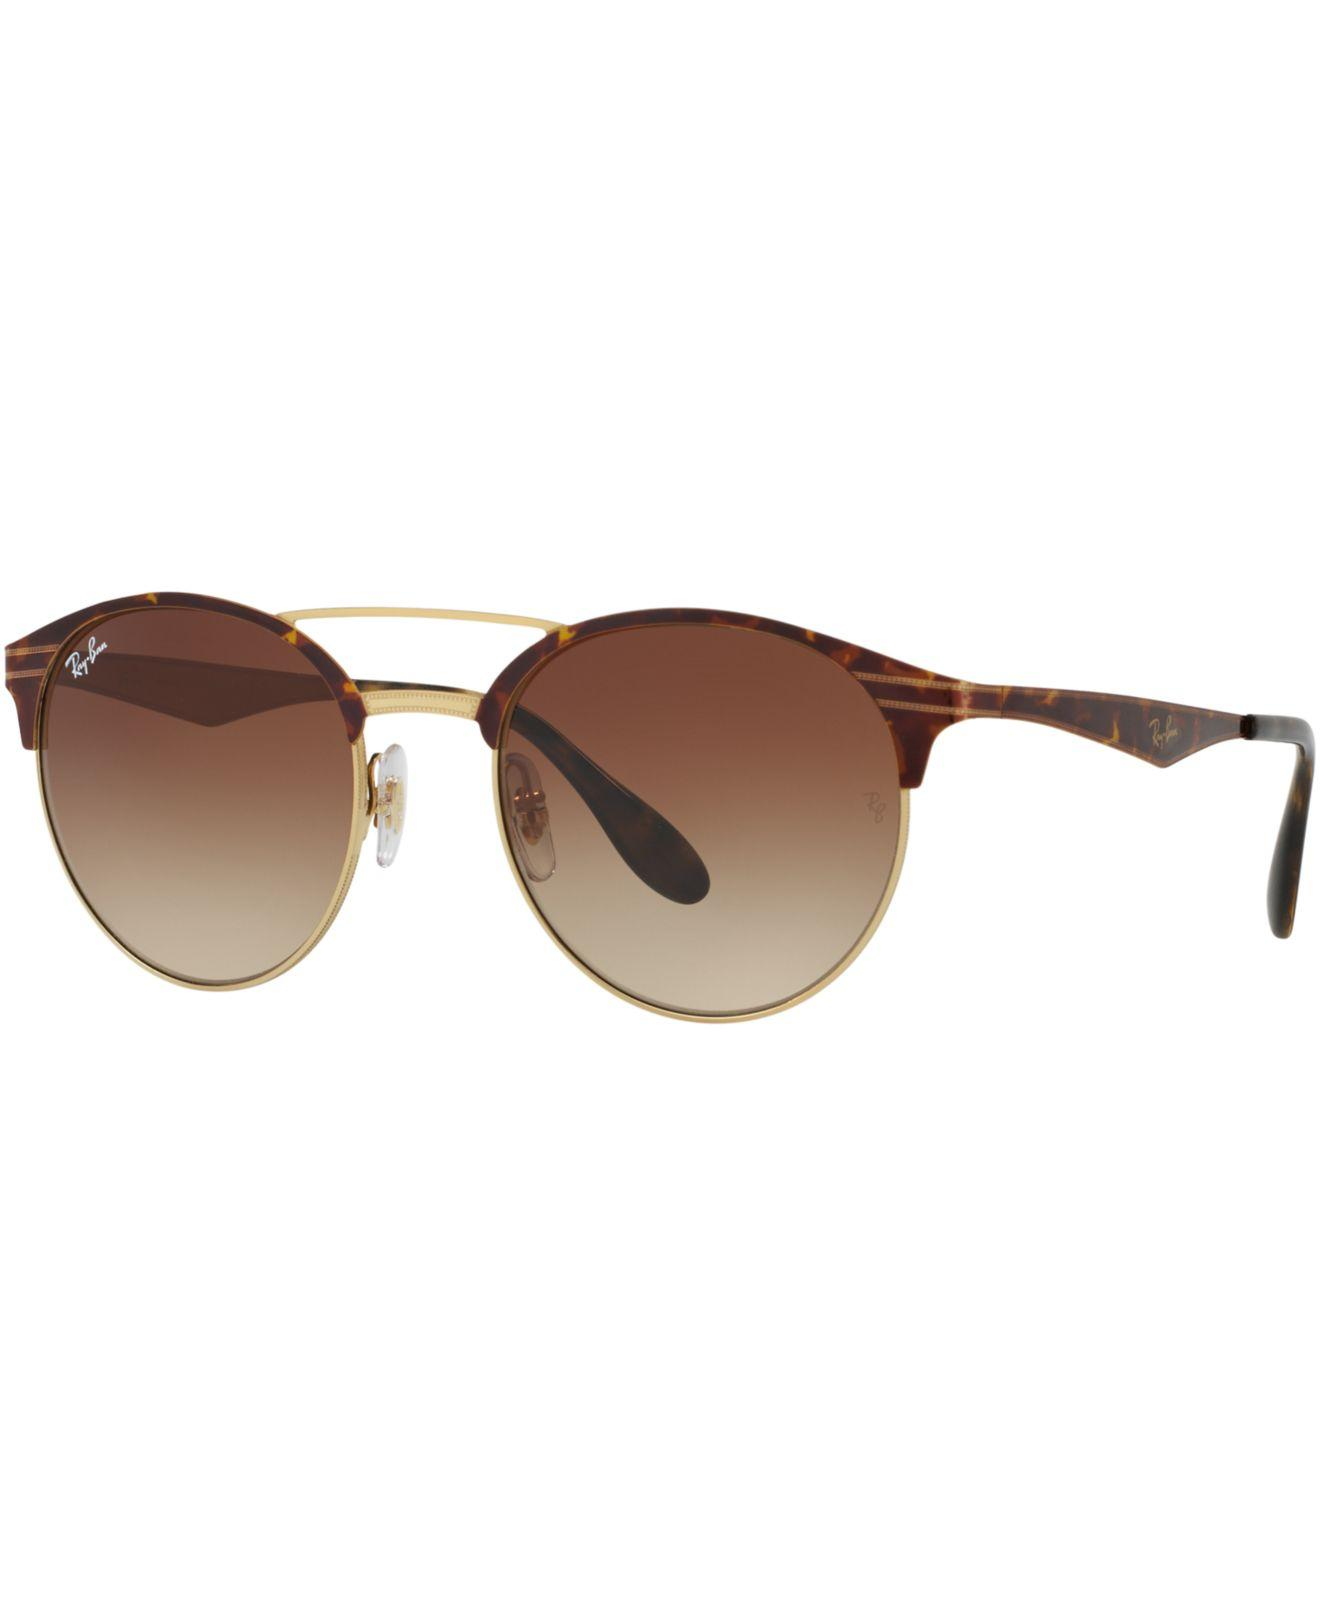 1b2f1ae3104 Ray-Ban. Women s Brown Highstreet Double-bridge Round Gradient Sunglasses